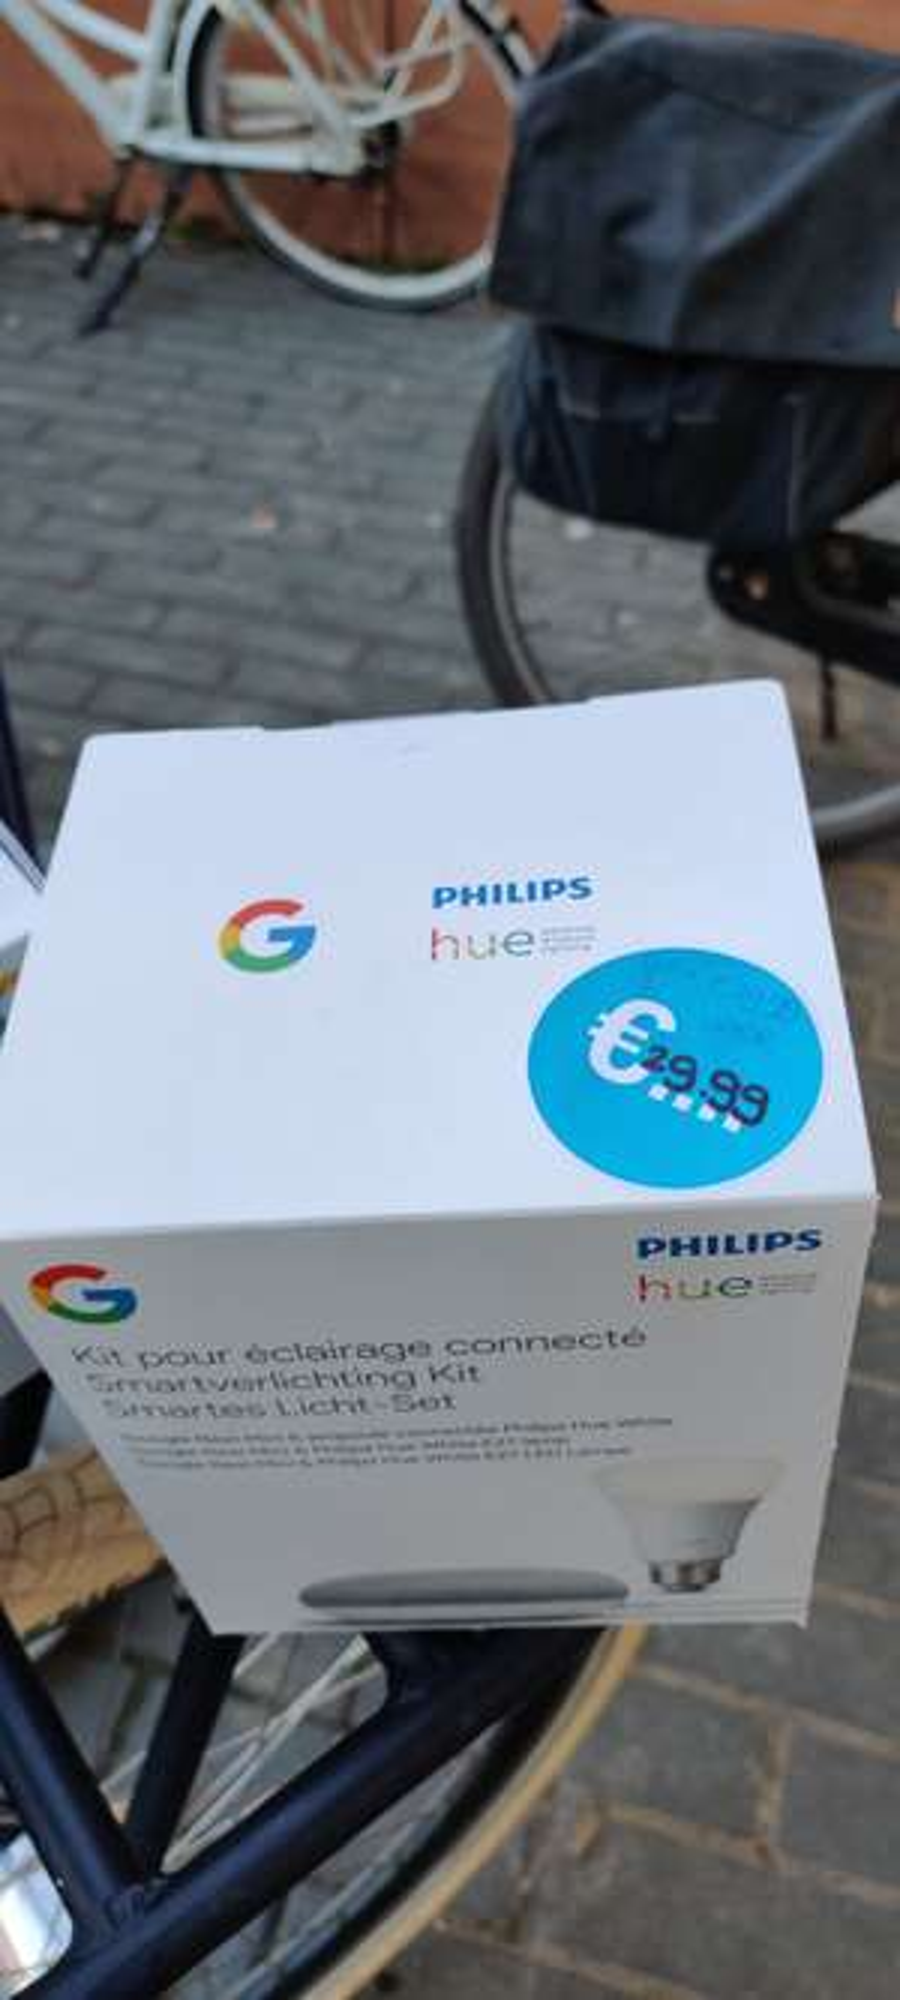 [Lokaal] Google Nest mini & Hue White E27 - AH Alkmaar Geert groteplein